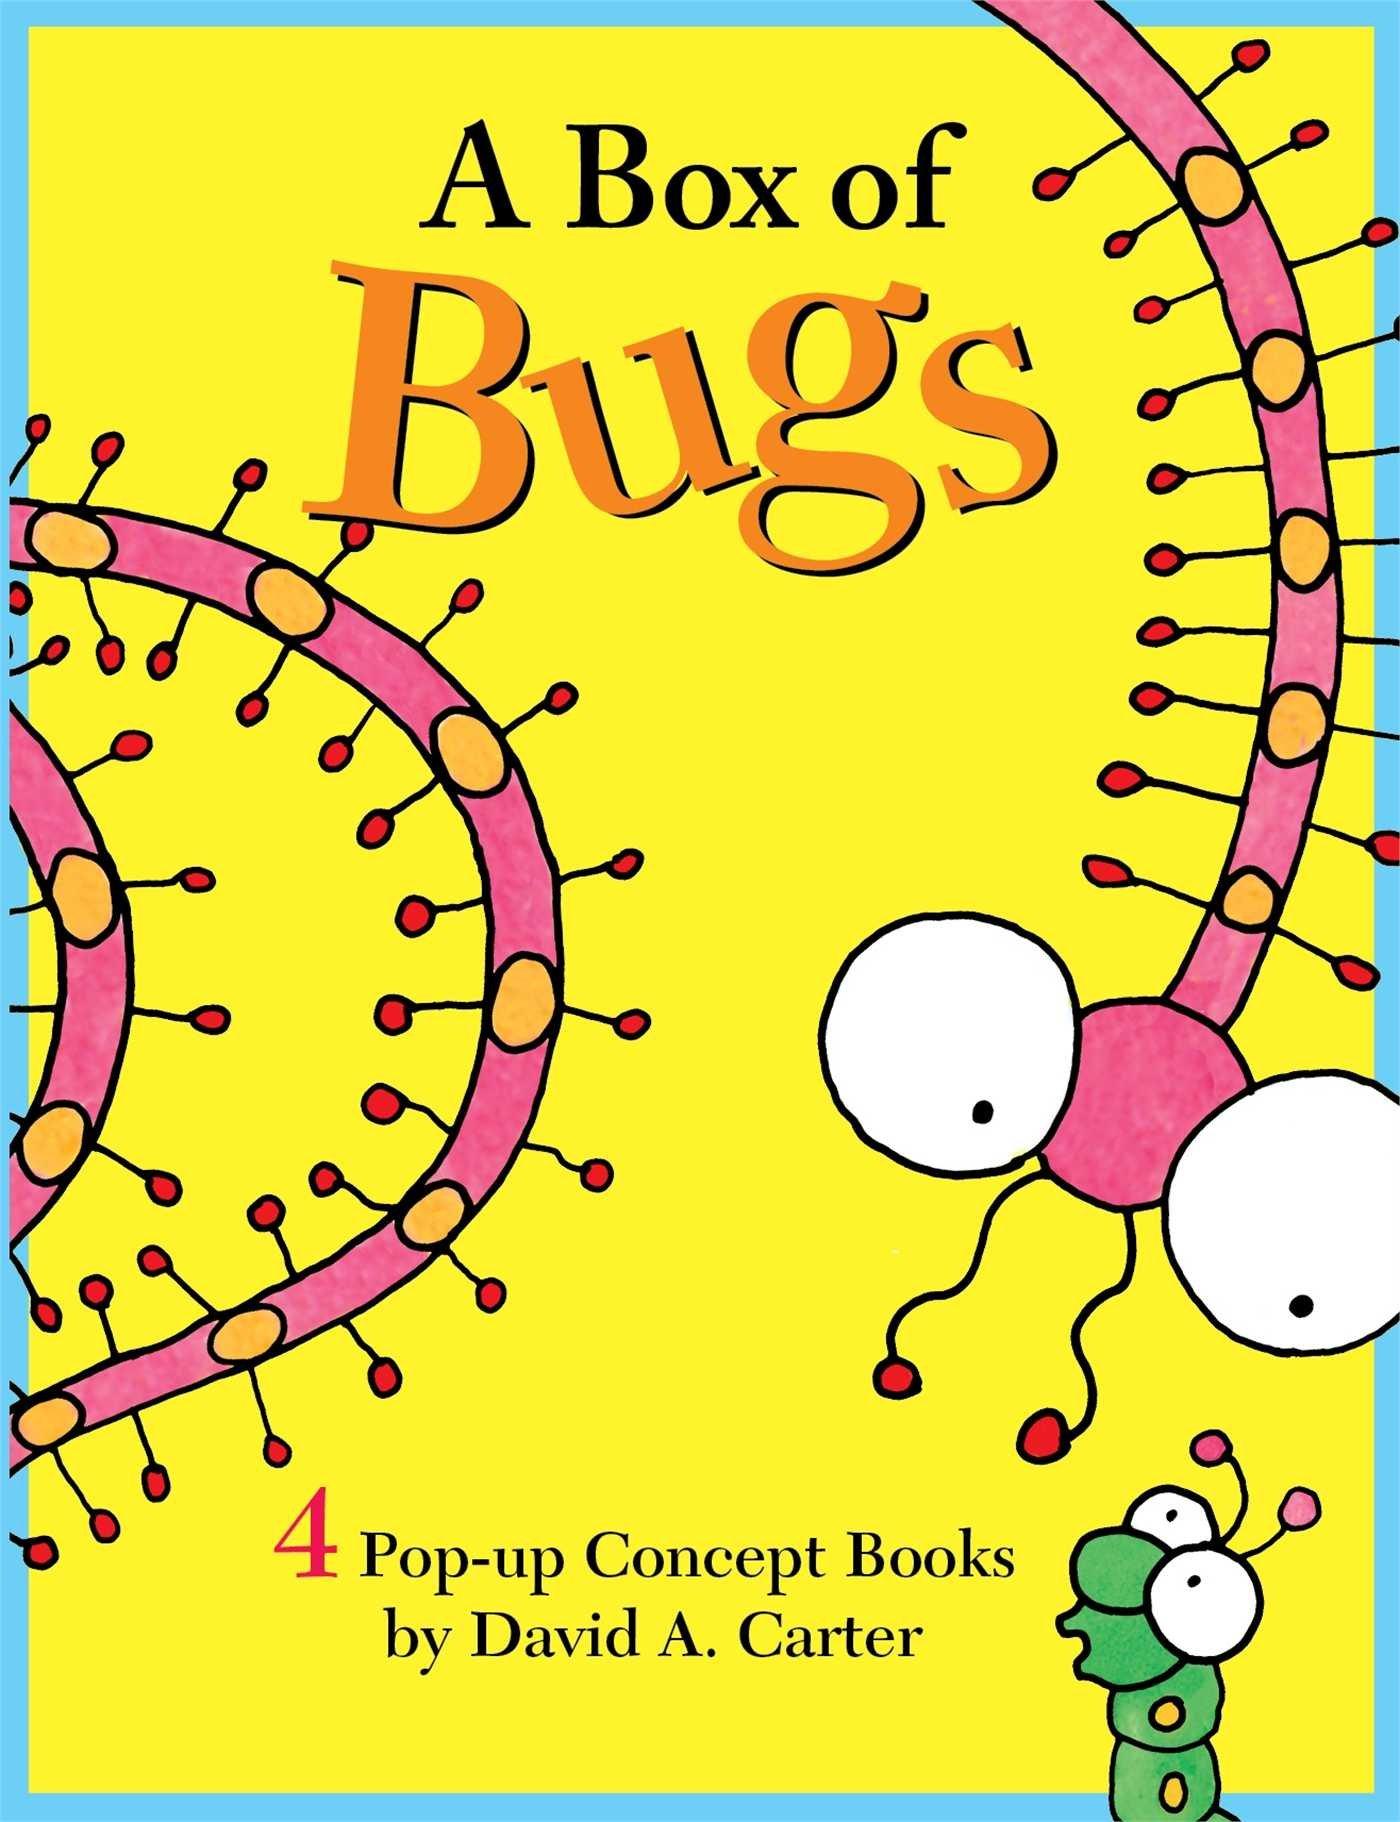 A Box of Bugs: 4 Pop-up Concept Books (David Carter's Bugs)